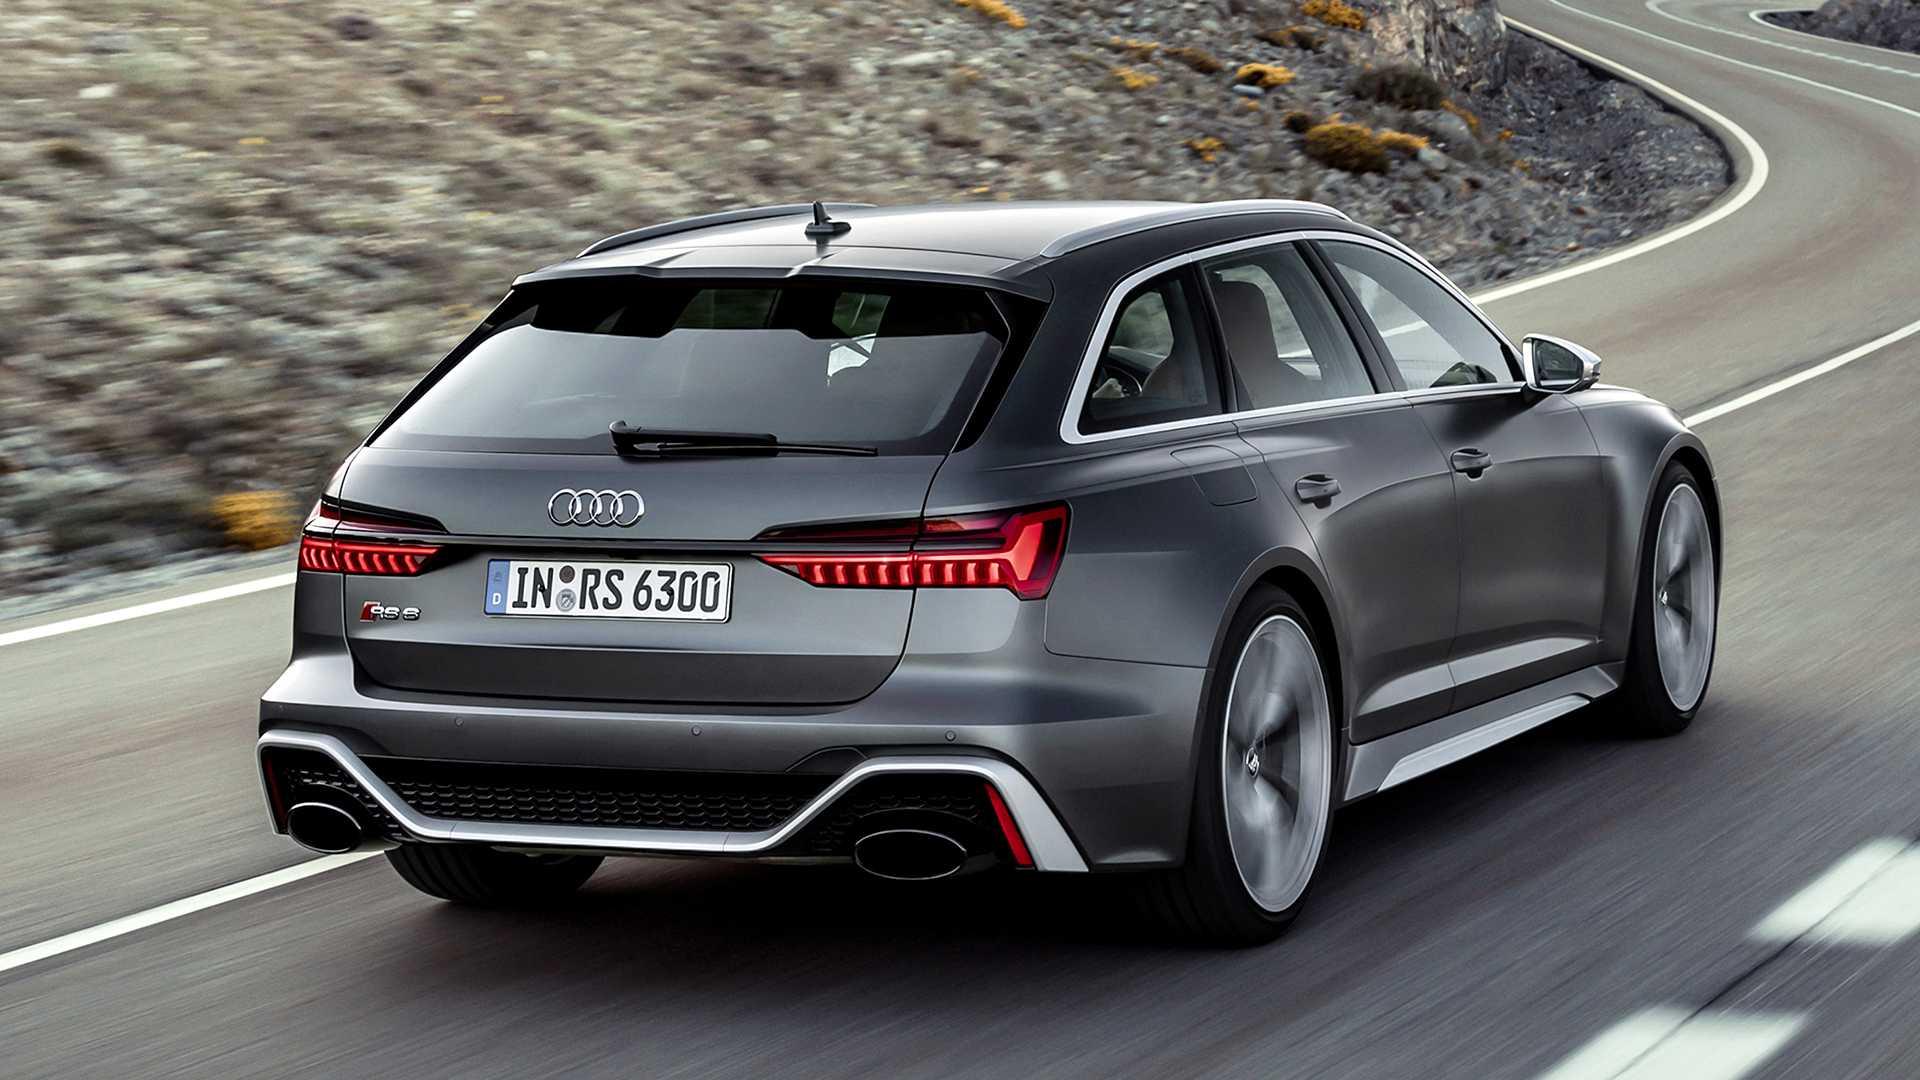 Audi Rs 6 Avant 2019 1 Audi Royal Oak